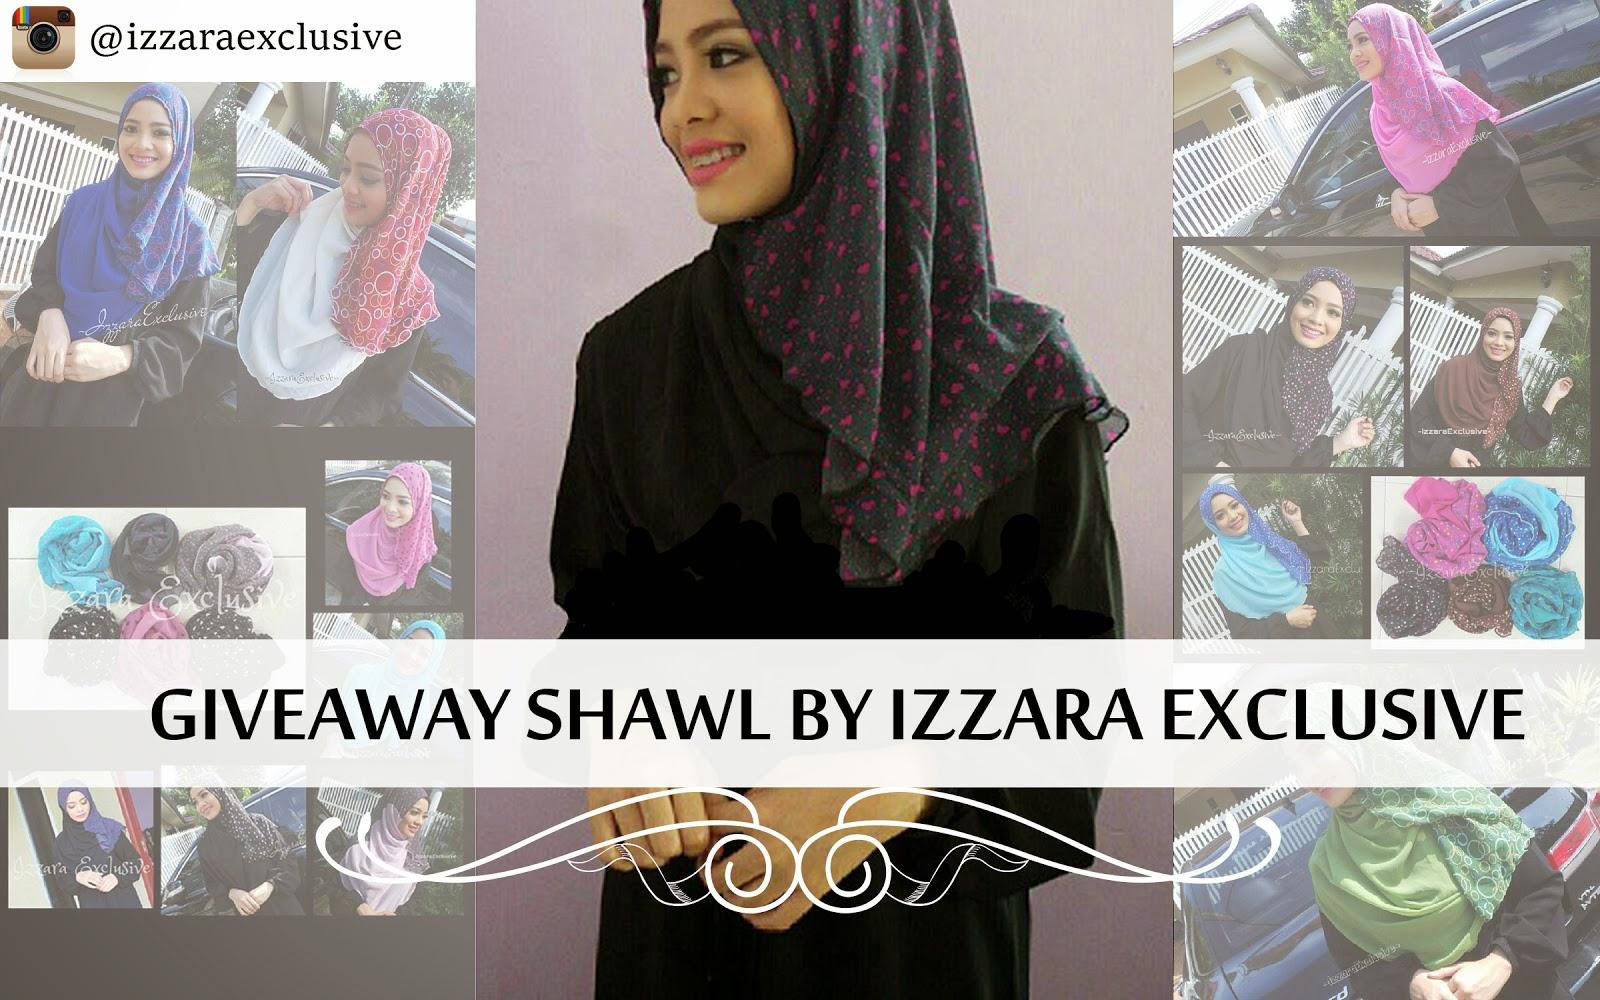 http://www.akusyafiq.com/2015/01/giveaway-shawl-by-izzara-exclusive.html